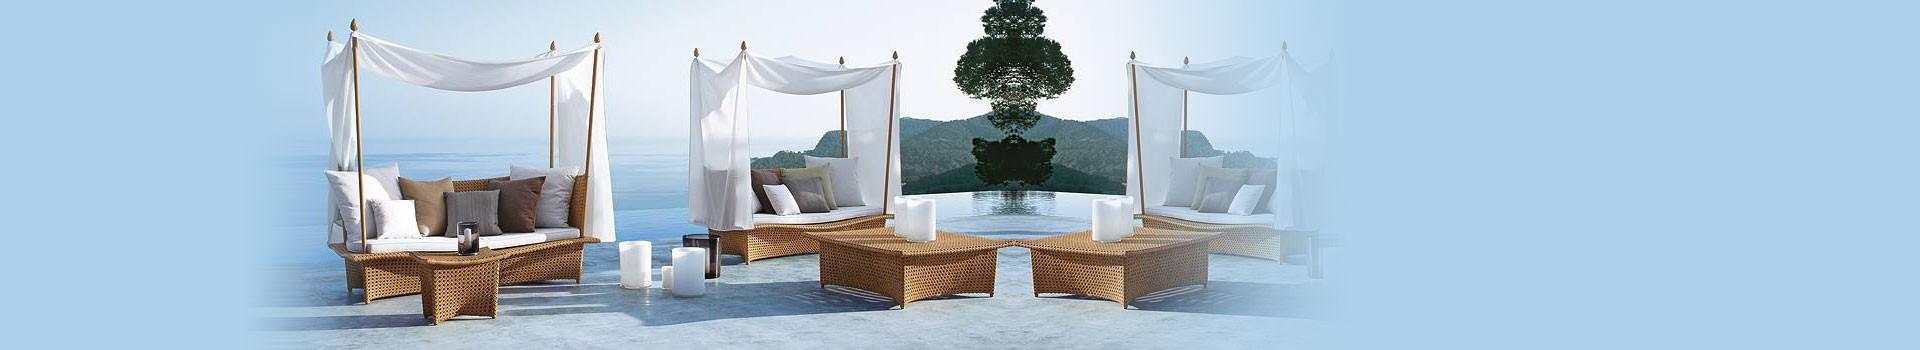 Modern Furniture Bangkok ghs | global hotel supply, bangkok, thailand – hotel, rattan